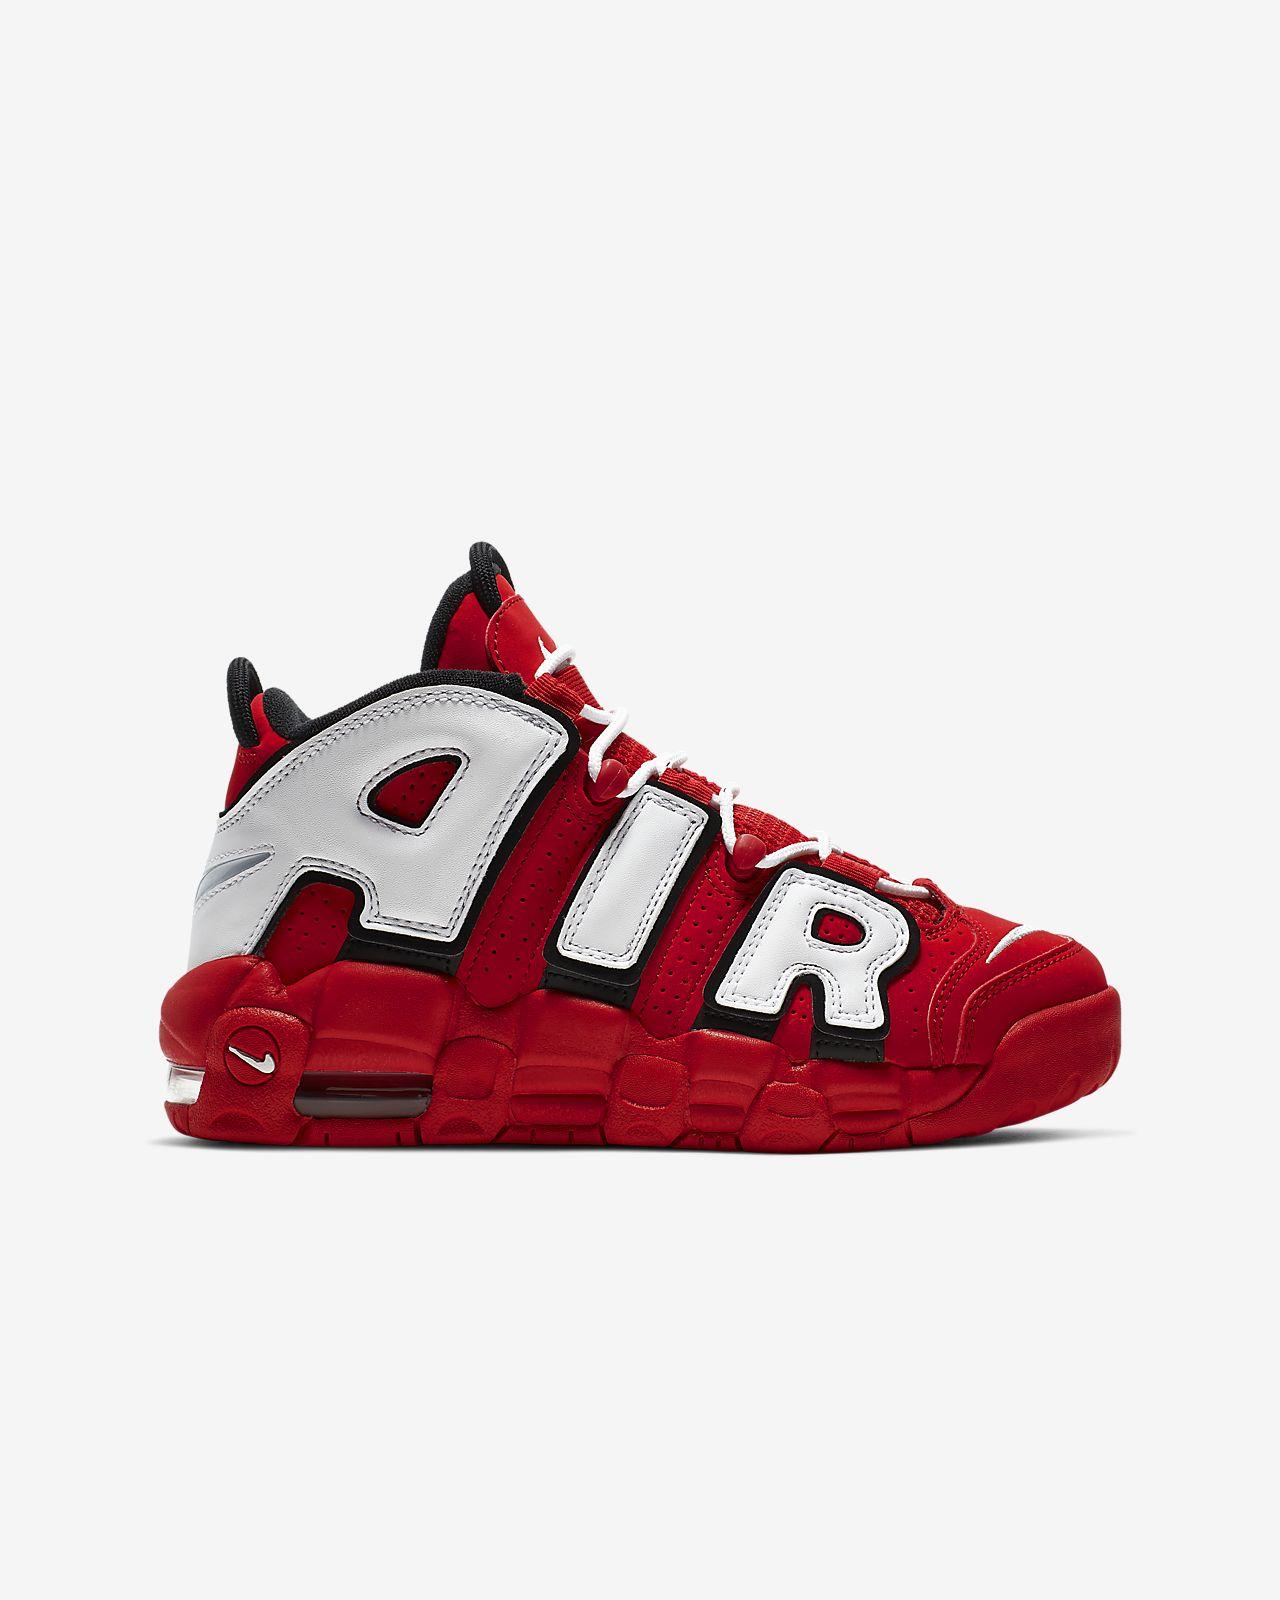 reputable site 6db76 d06bb ... Nike Air More Uptempo QS Big Kids  Shoe